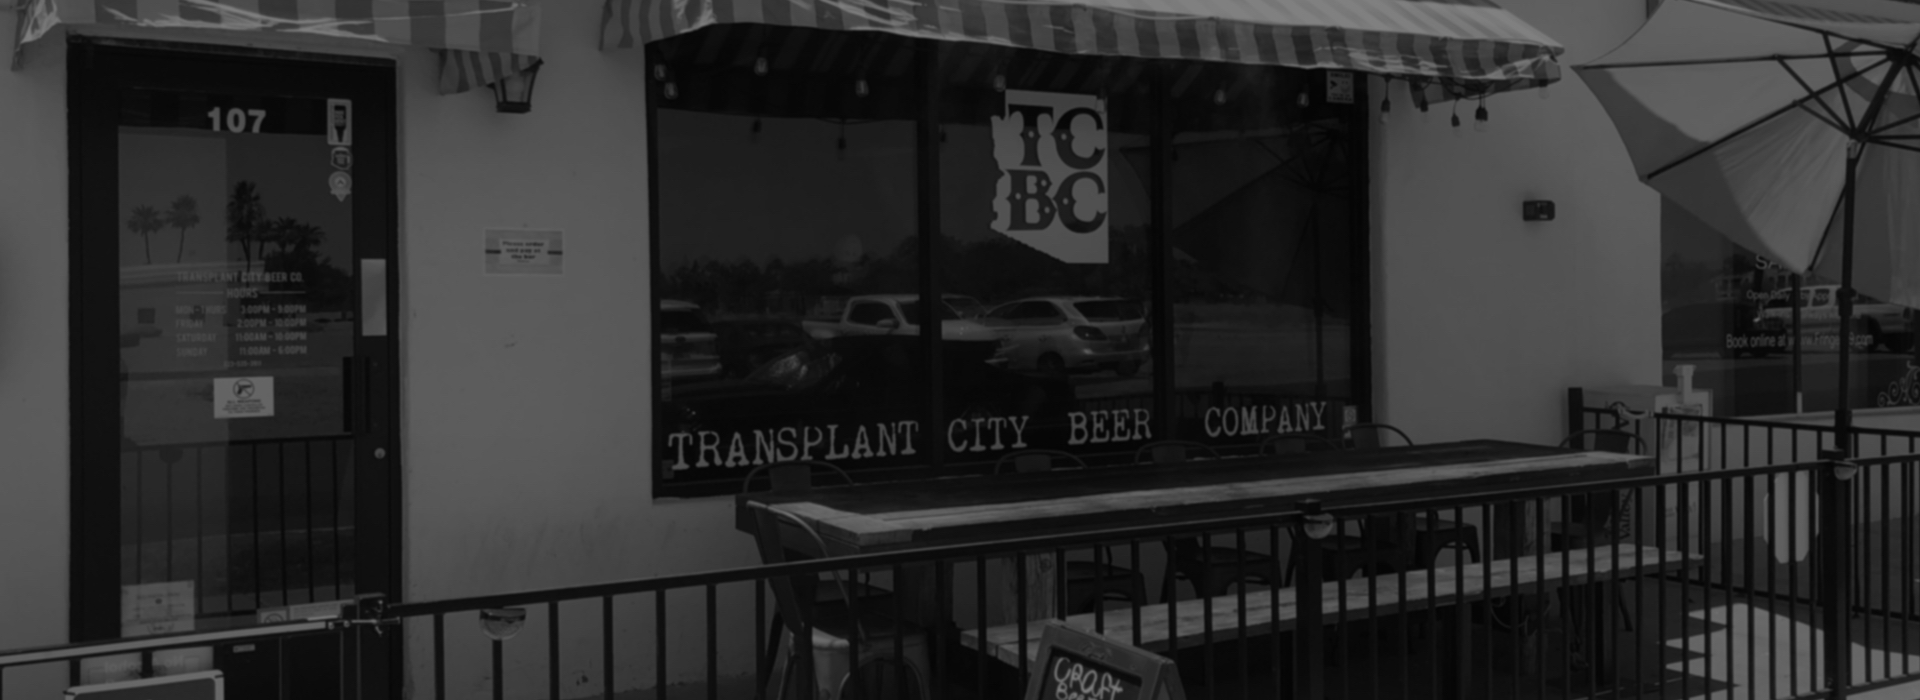 Transplant City Beer Company